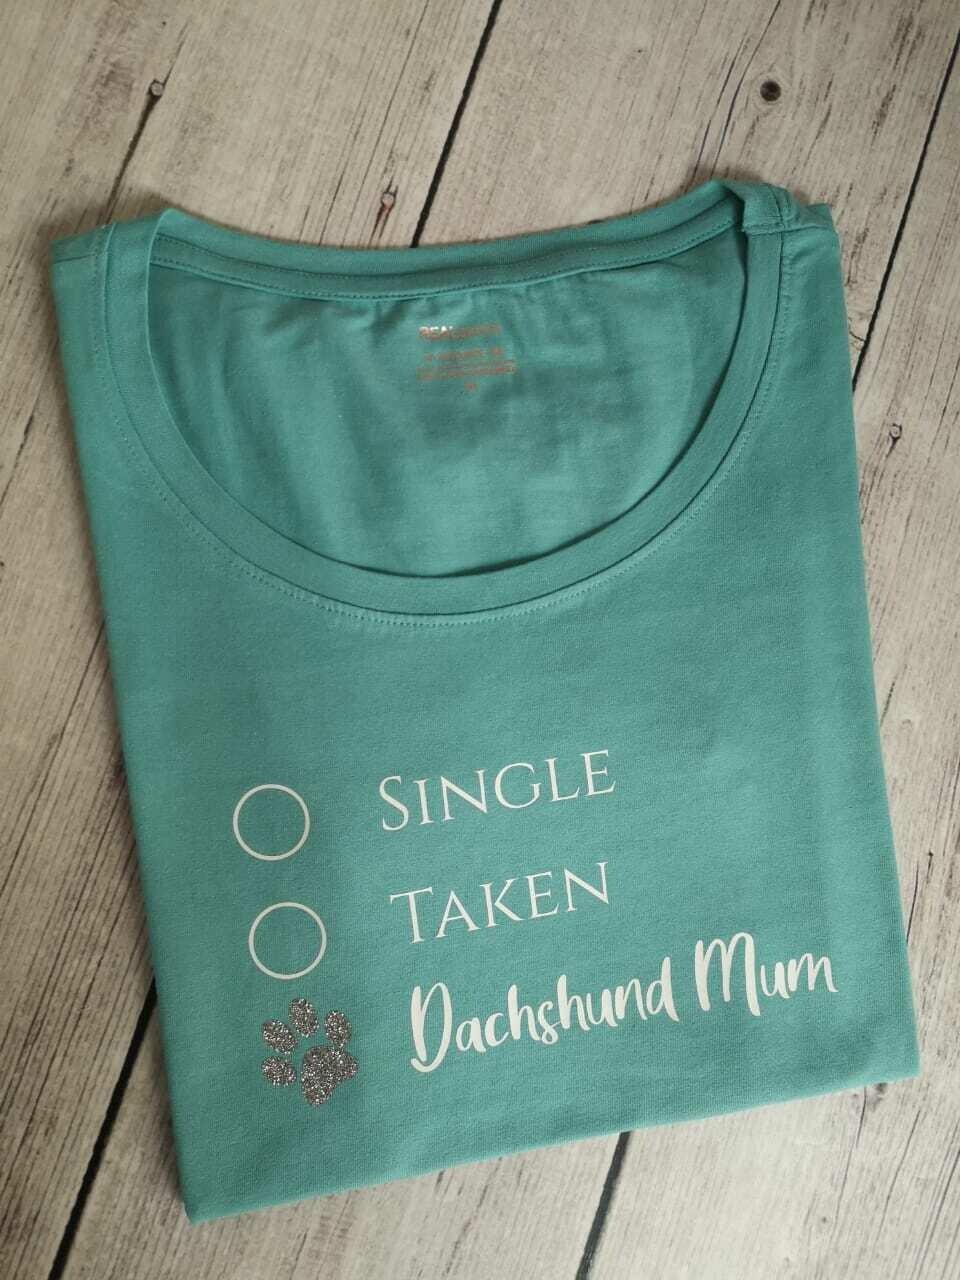 Dachshund Dating Range T-Shirt 1 - Blue/Green - Short Sleeve - LADIES CUT (Round-Neck)